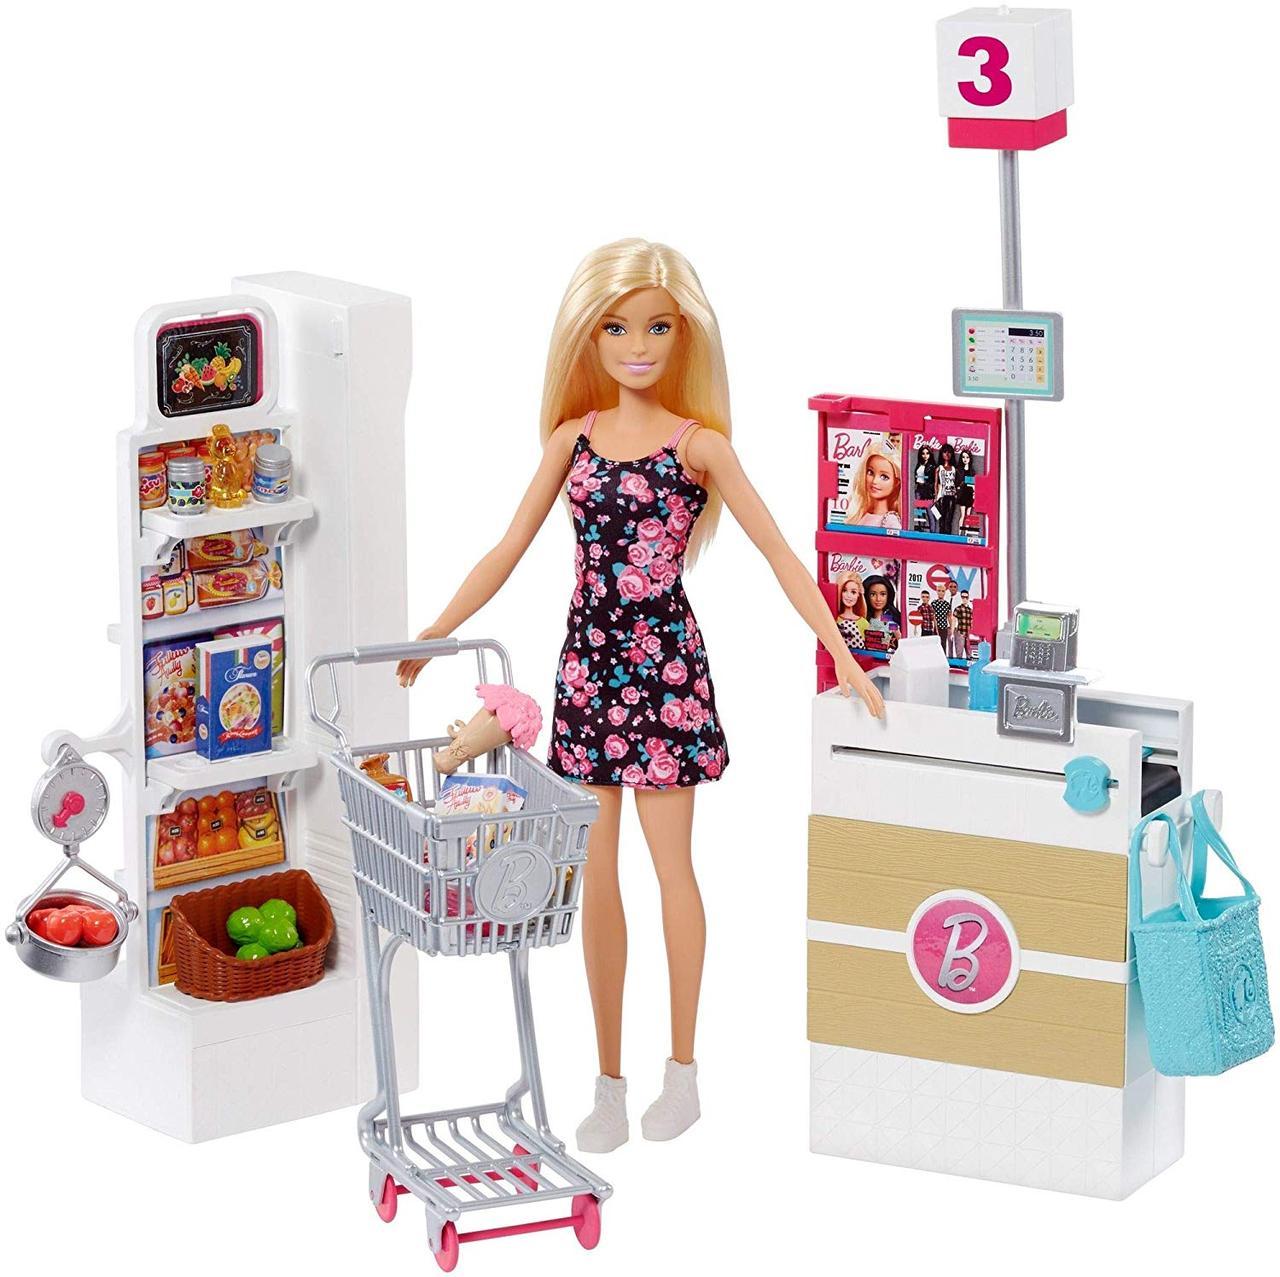 Барби в супермаркете Оригинал Barbie Supermarket Set, Blonde (FRP01) (887961632309)